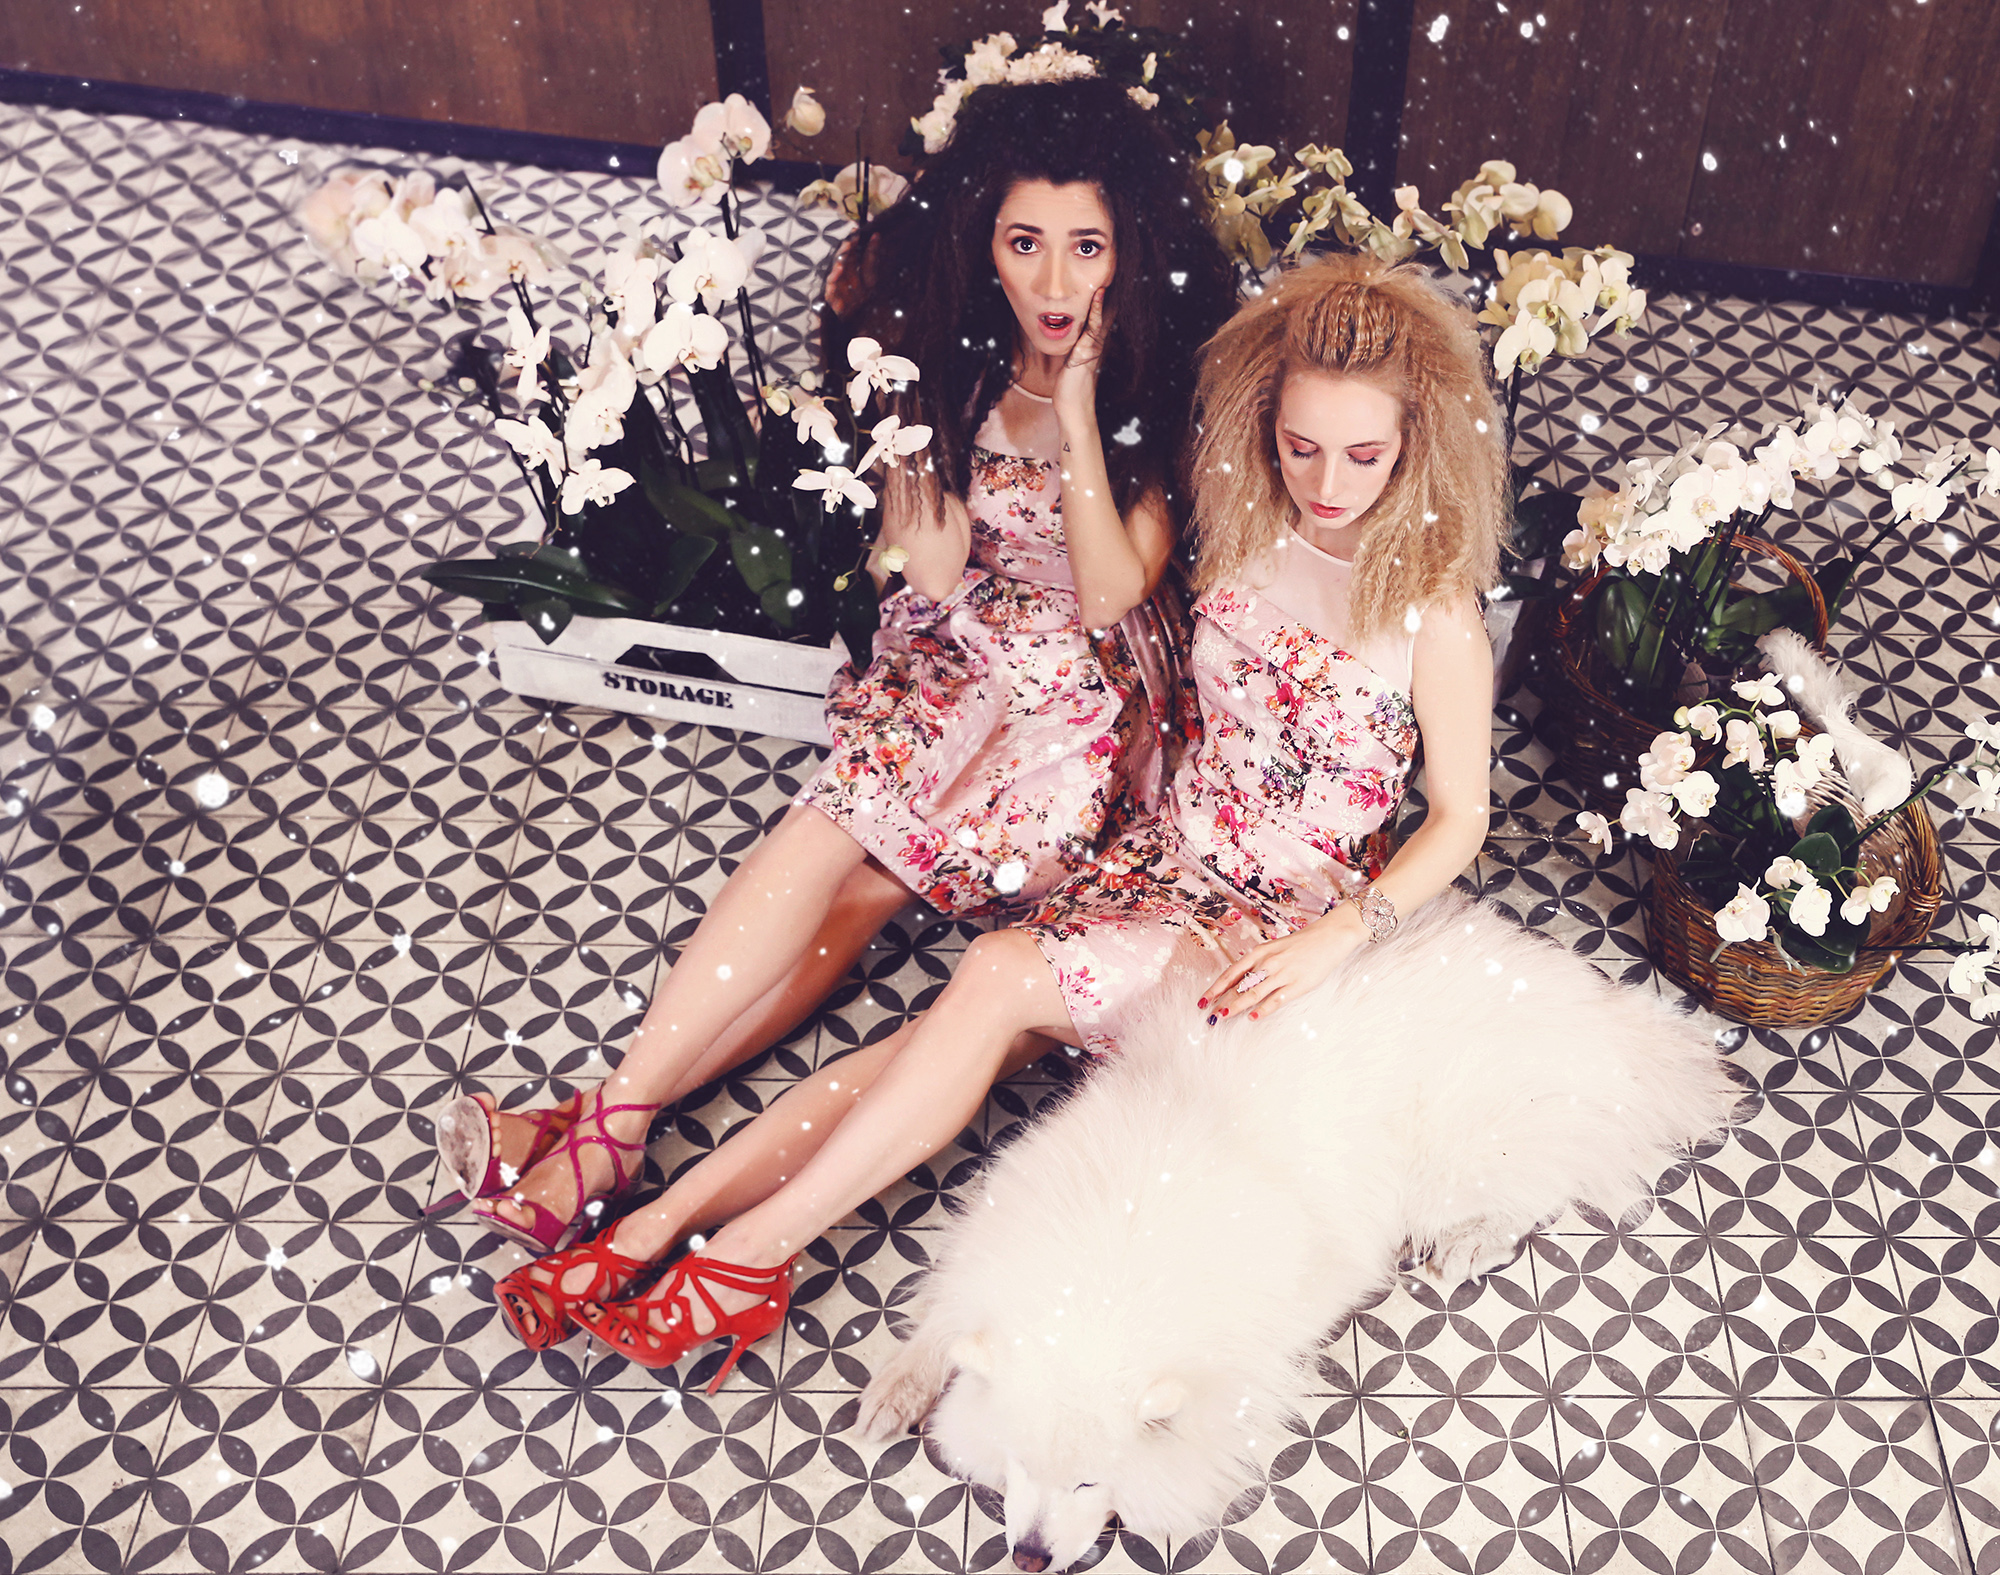 deilani collection_deilani shop_fabulousmuses_alina tanasa_diana enciu_blog moda_fashion blogger (1)